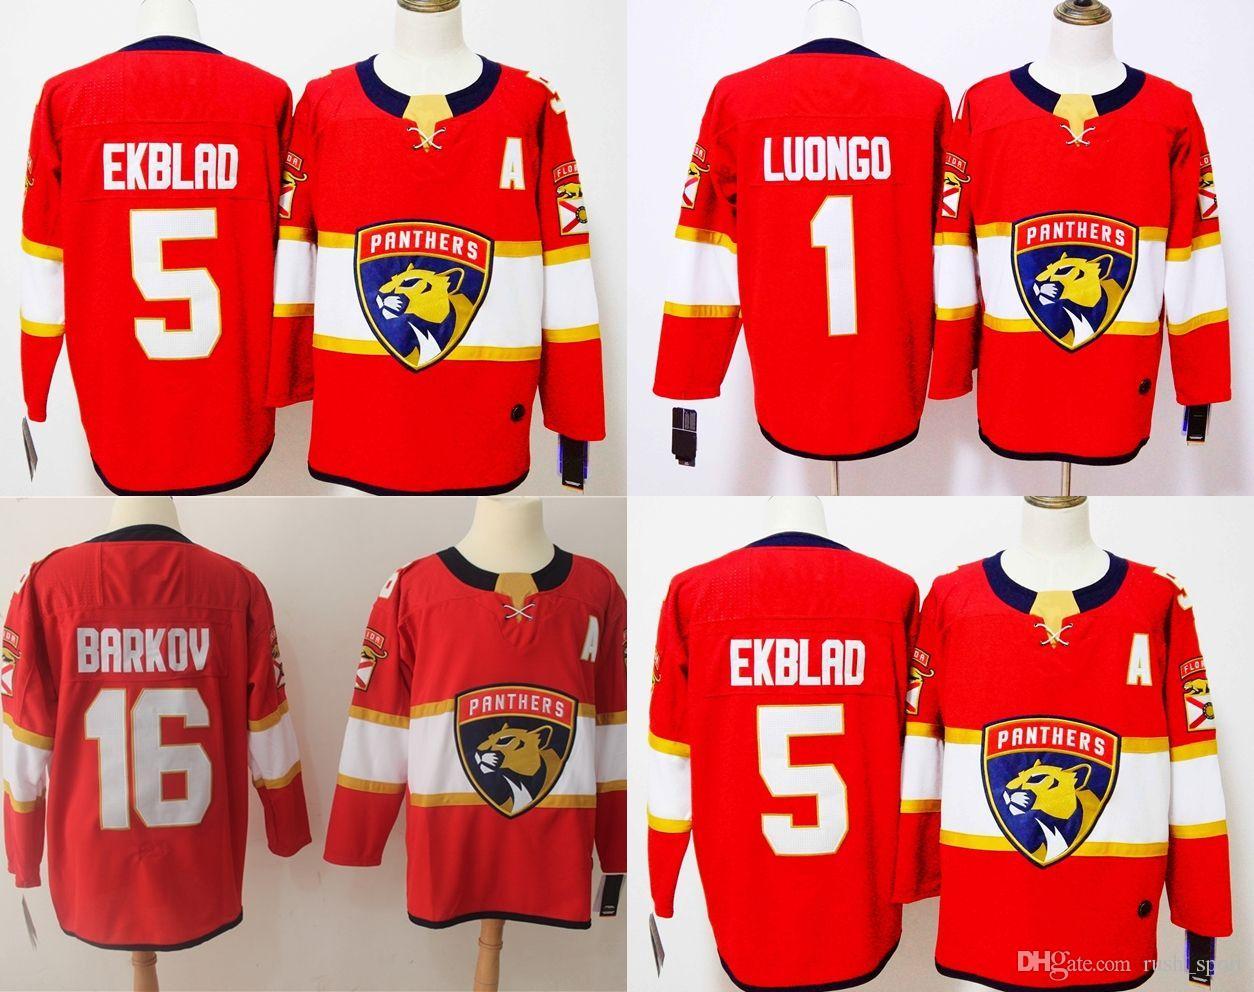 8916c75baad 2018 Season AD Florida Panthers Cheap Hockey Jerseys LUONGO 1 EKBLAD ...